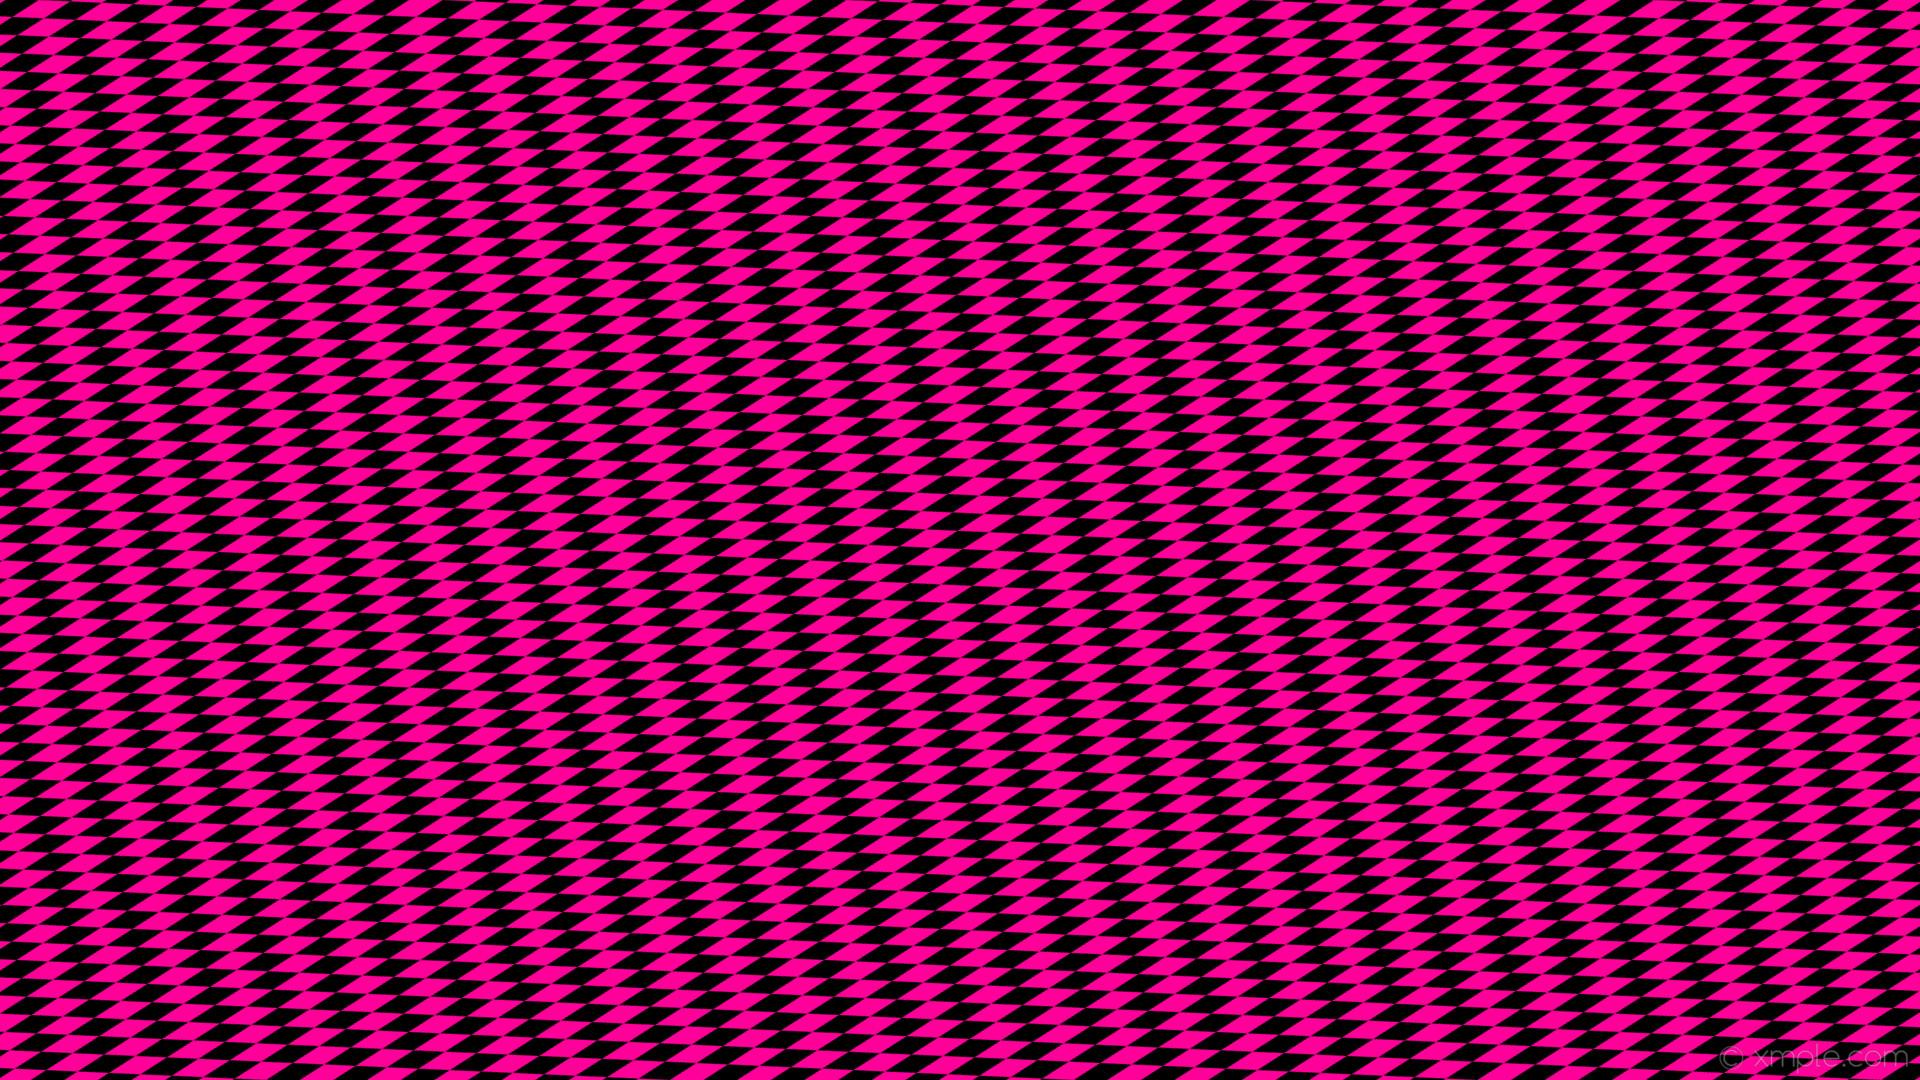 wallpaper rhombus lozenge black pink diamond #000000 #ff0099 15° 60px 19px